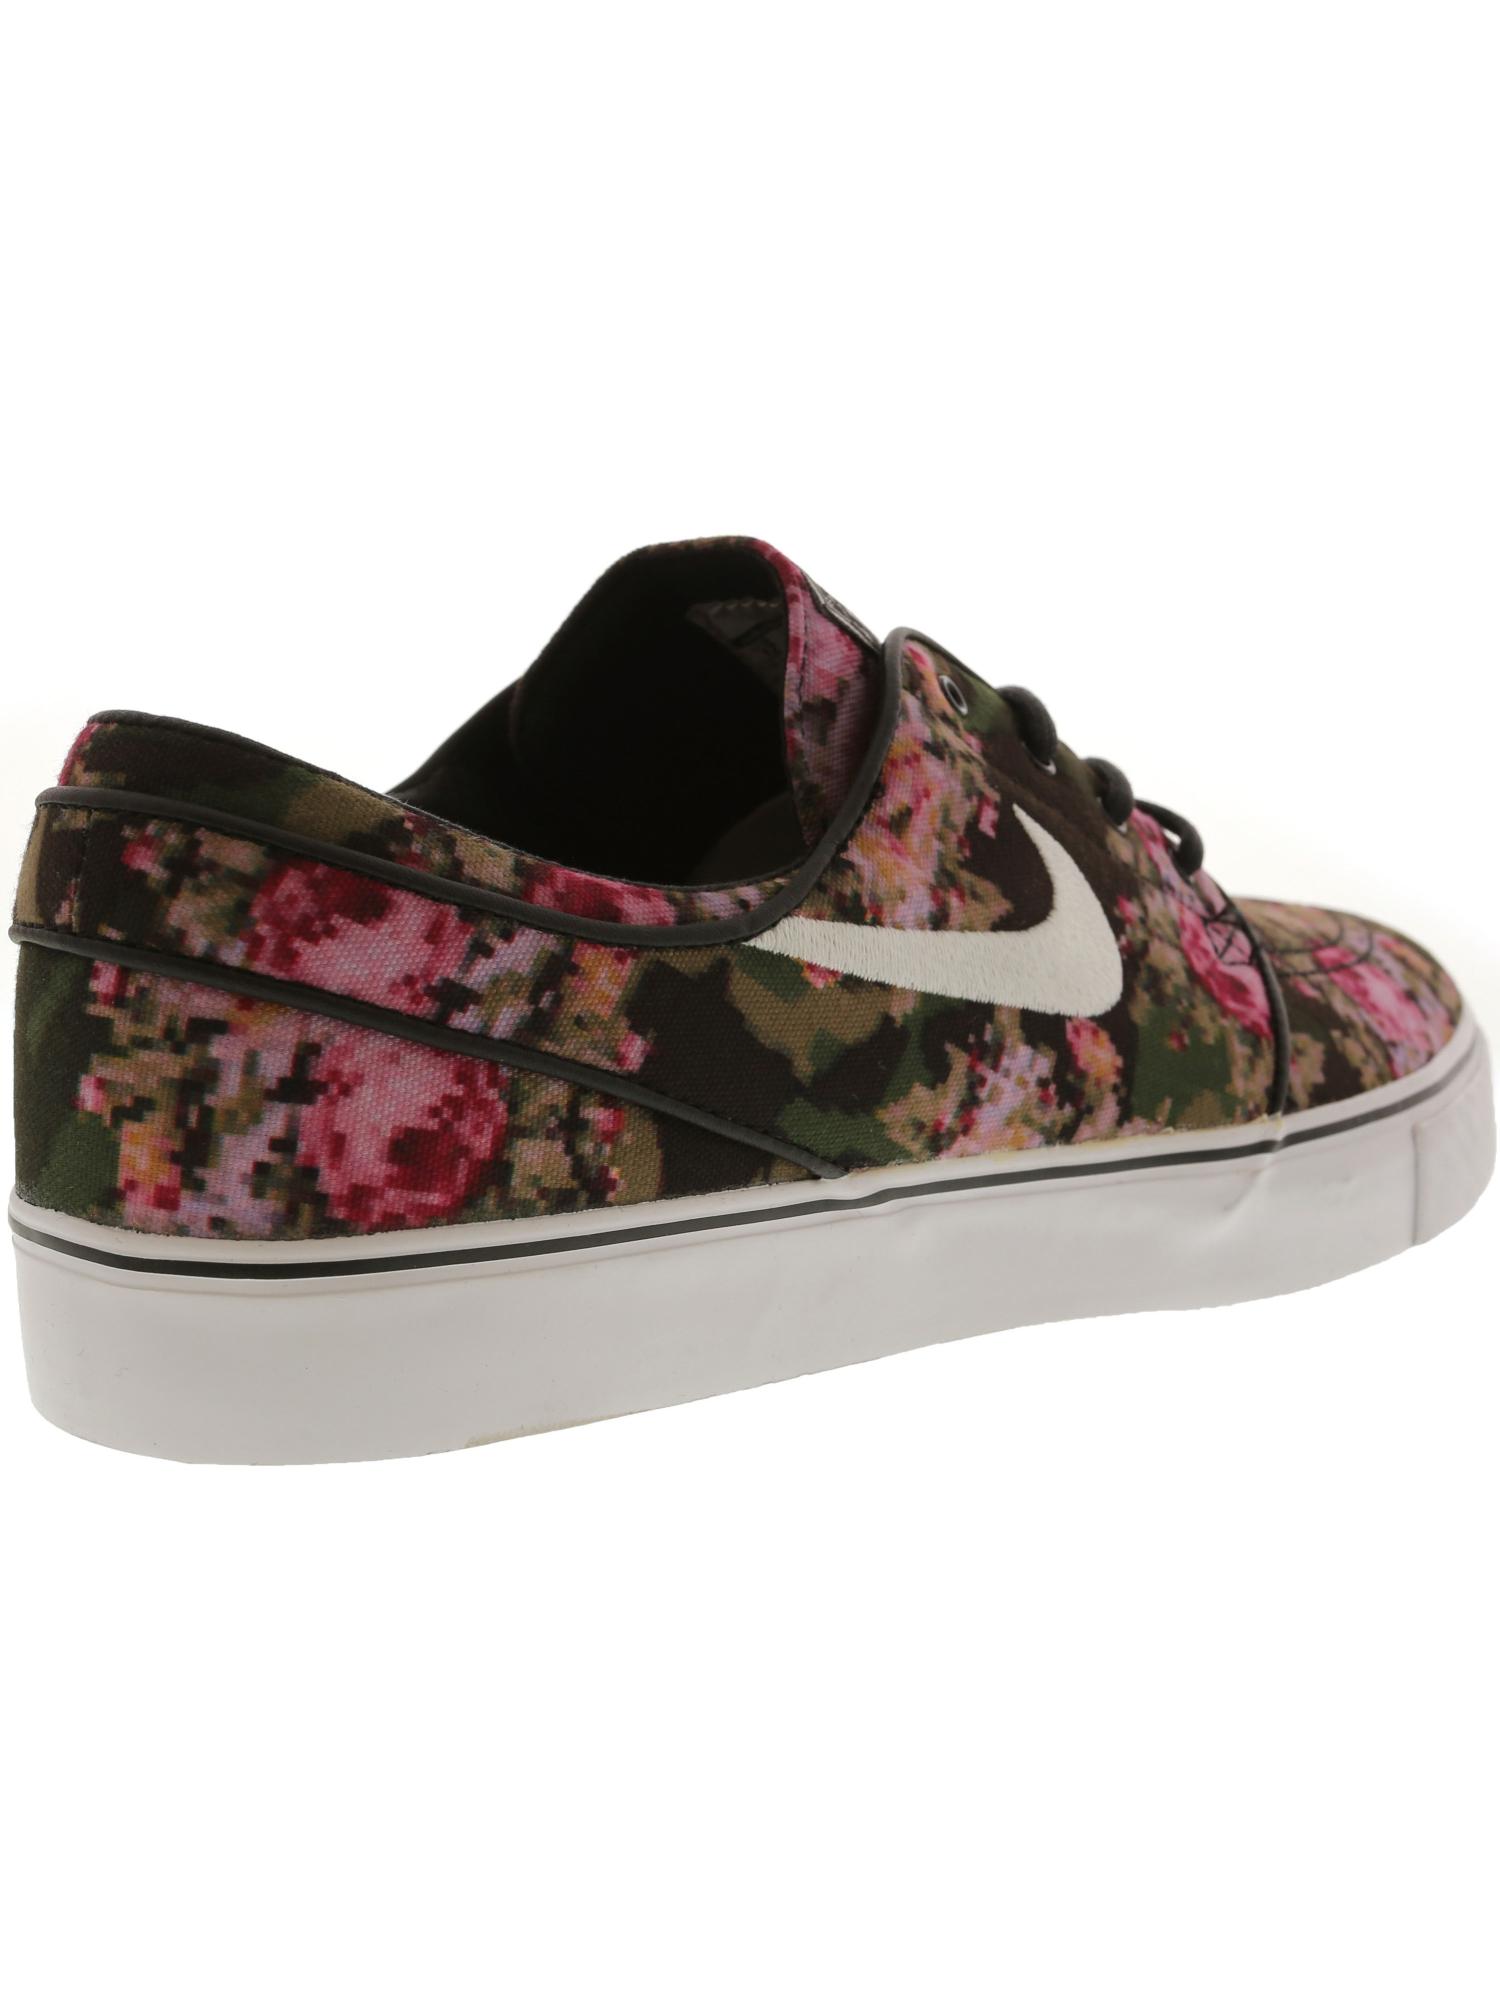 Nike-Men-039-s-Zoom-Stefan-Janoski-Premium-Ankle-High-Leather-Skateboarding-Shoe